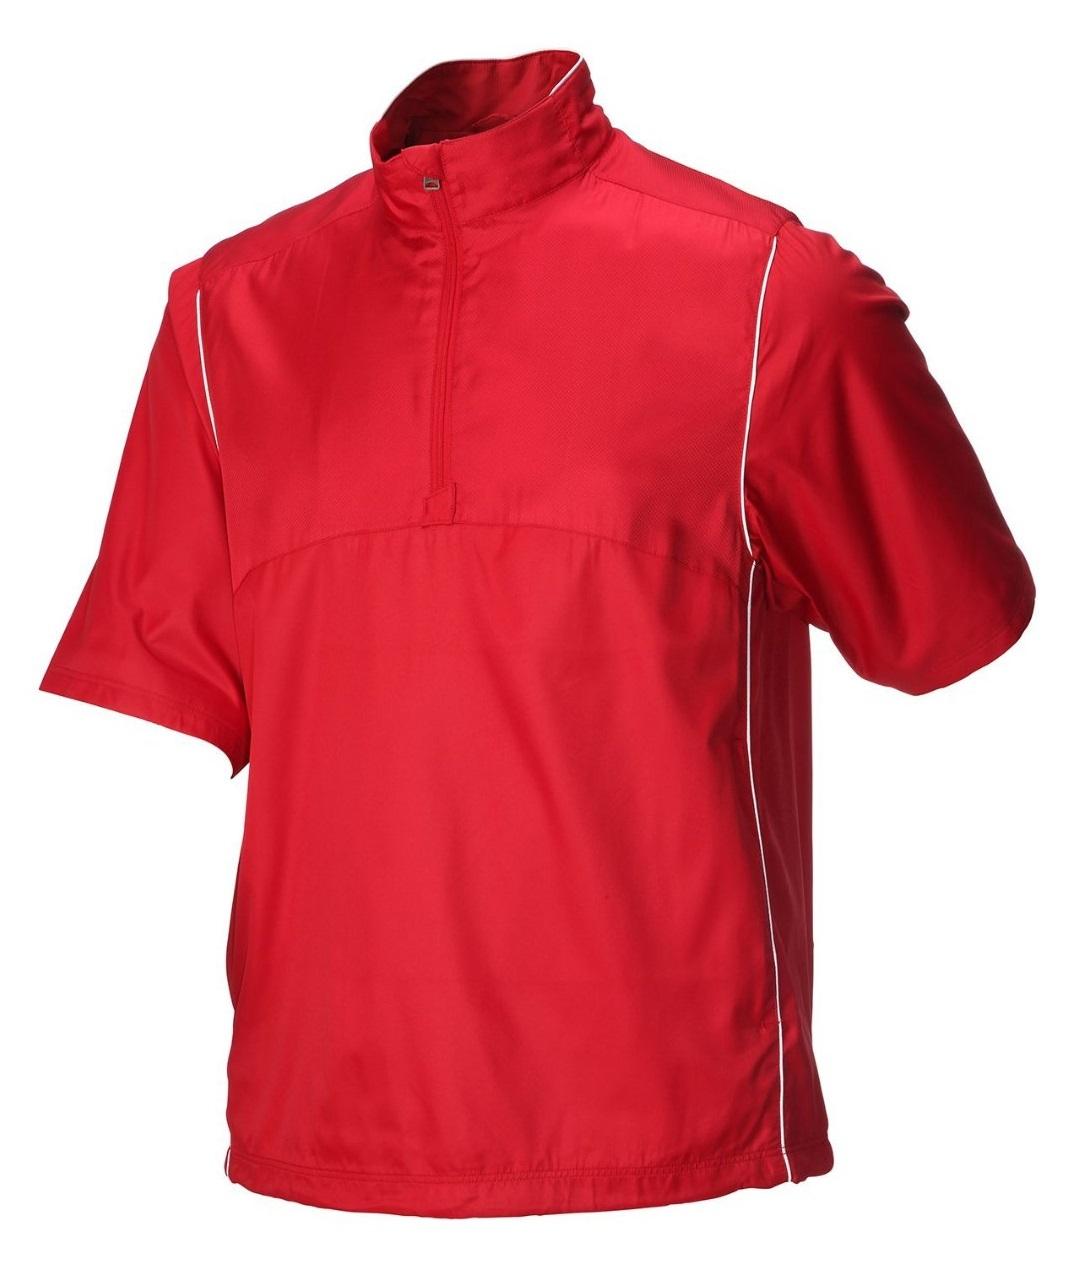 Mens Greg Norman Short Sleeve Golf Jackets